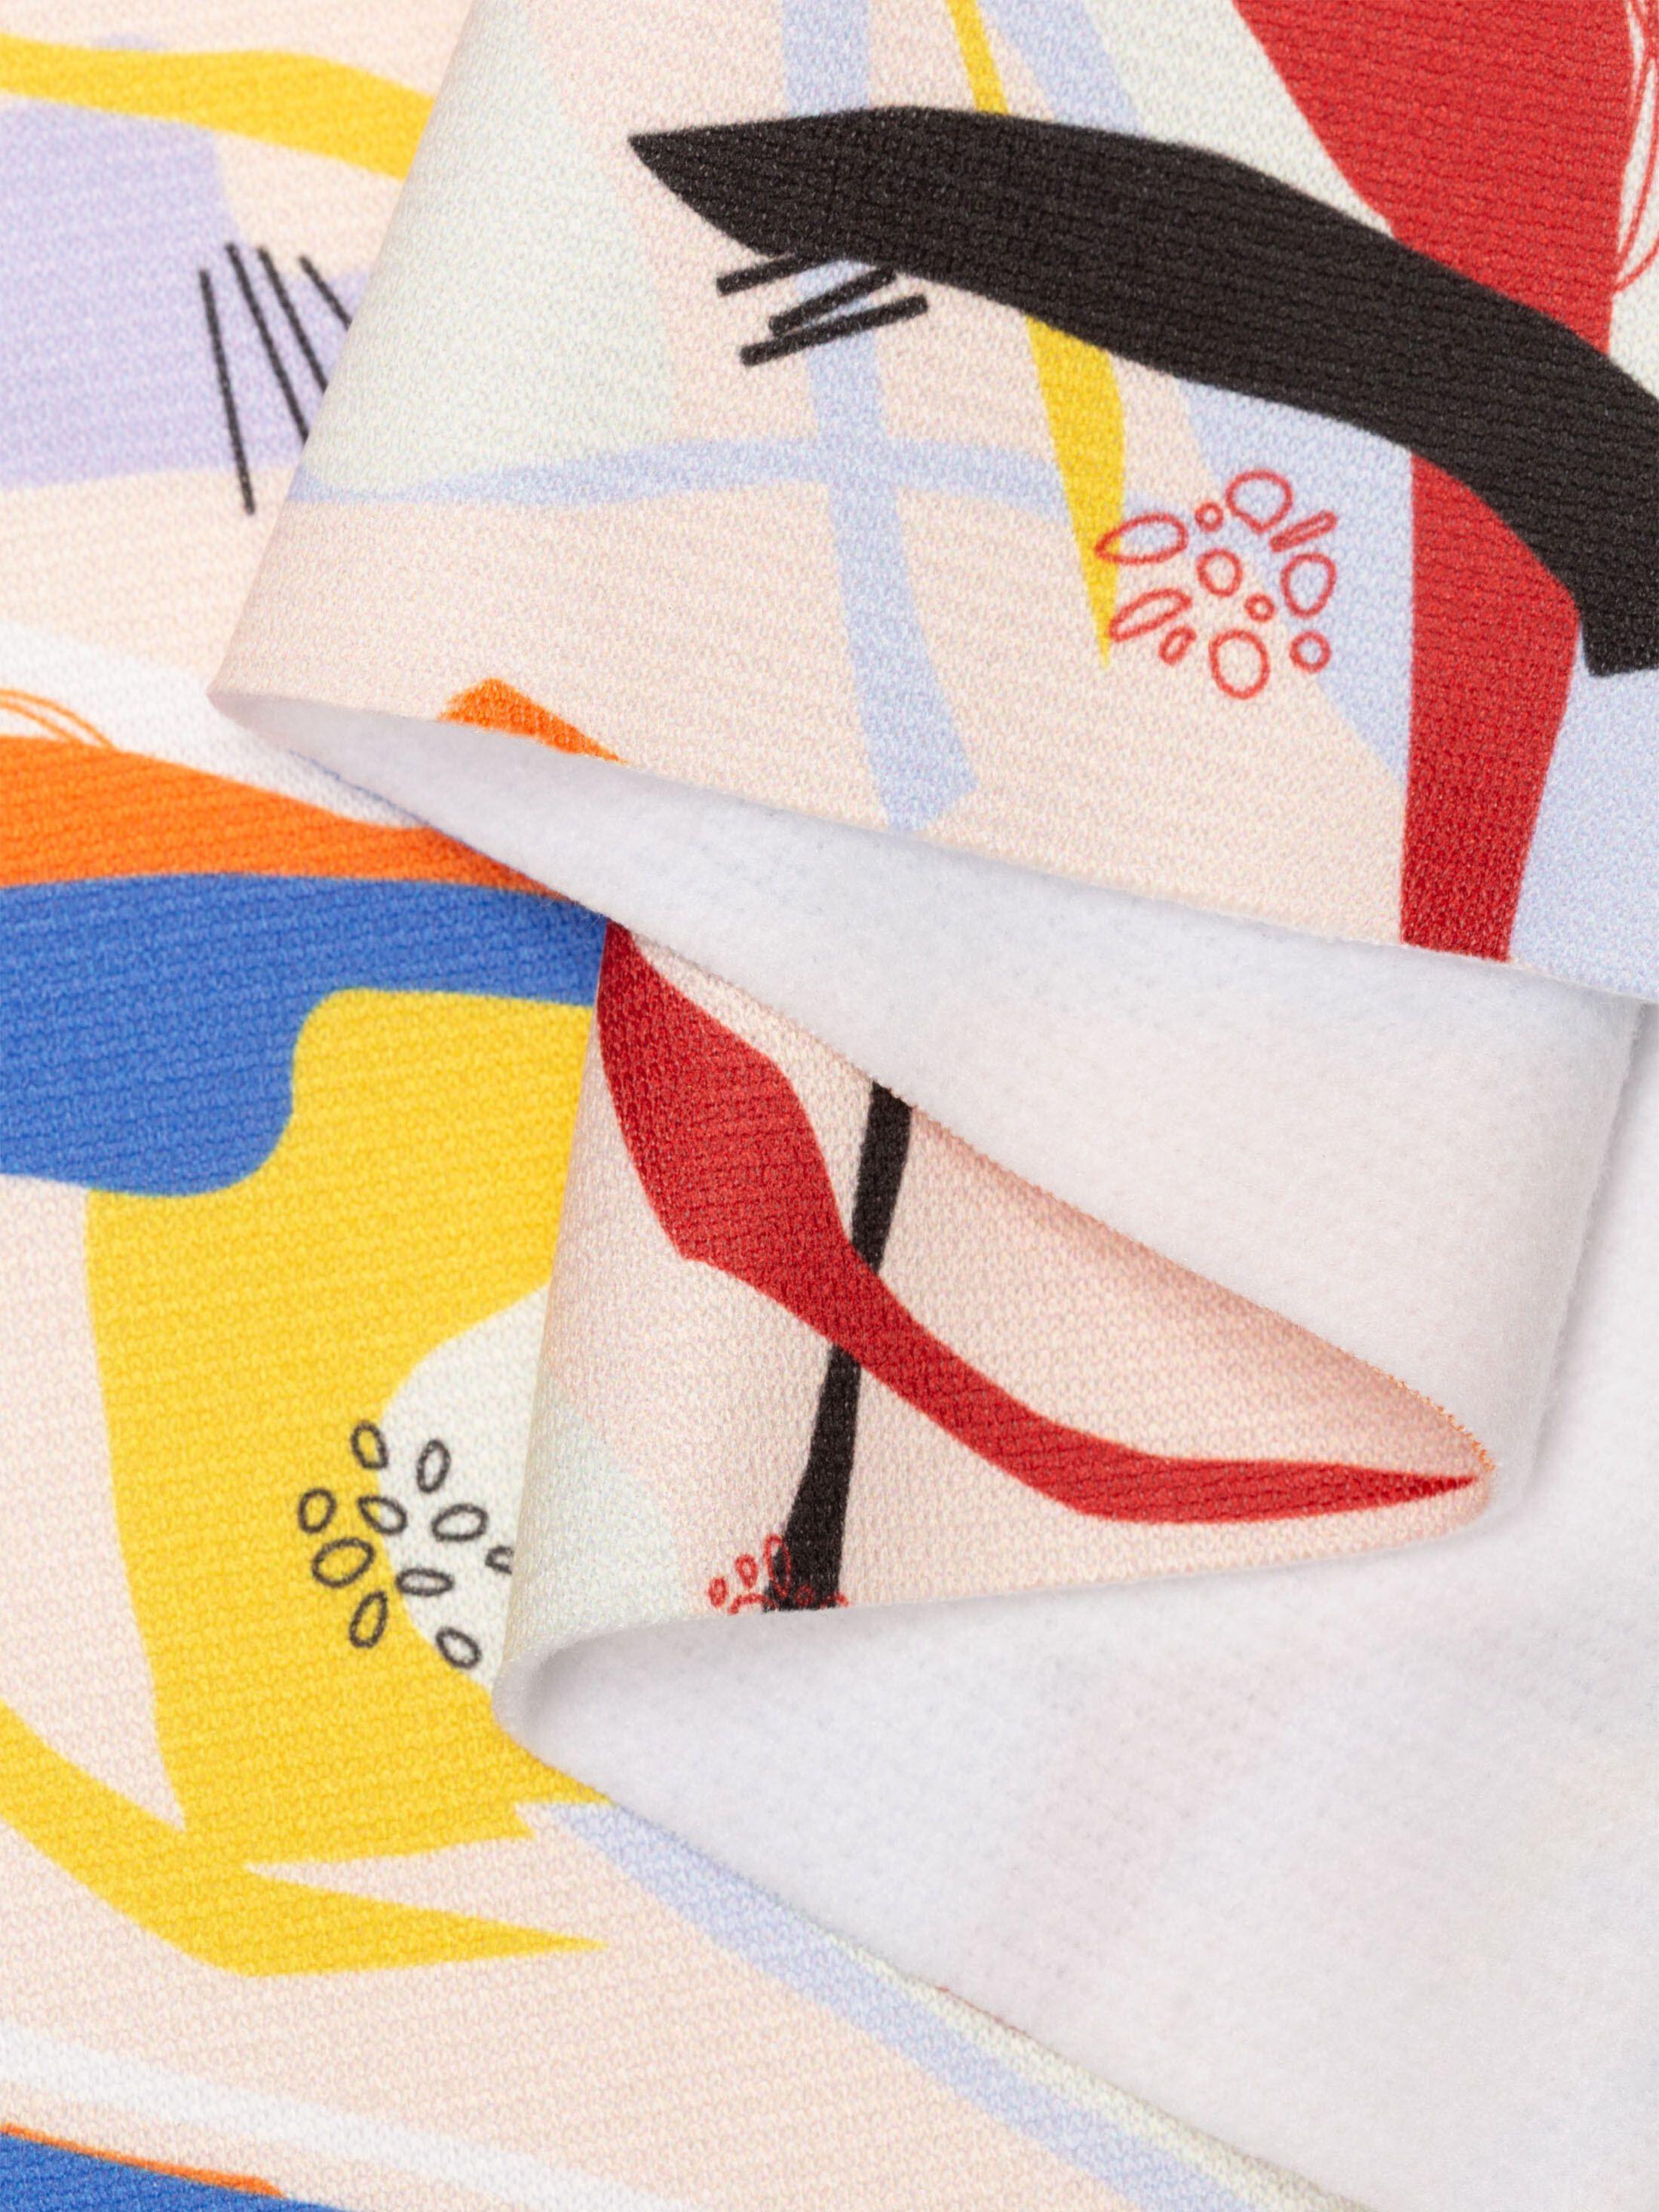 Heavy Jersey digital print fabric pinned